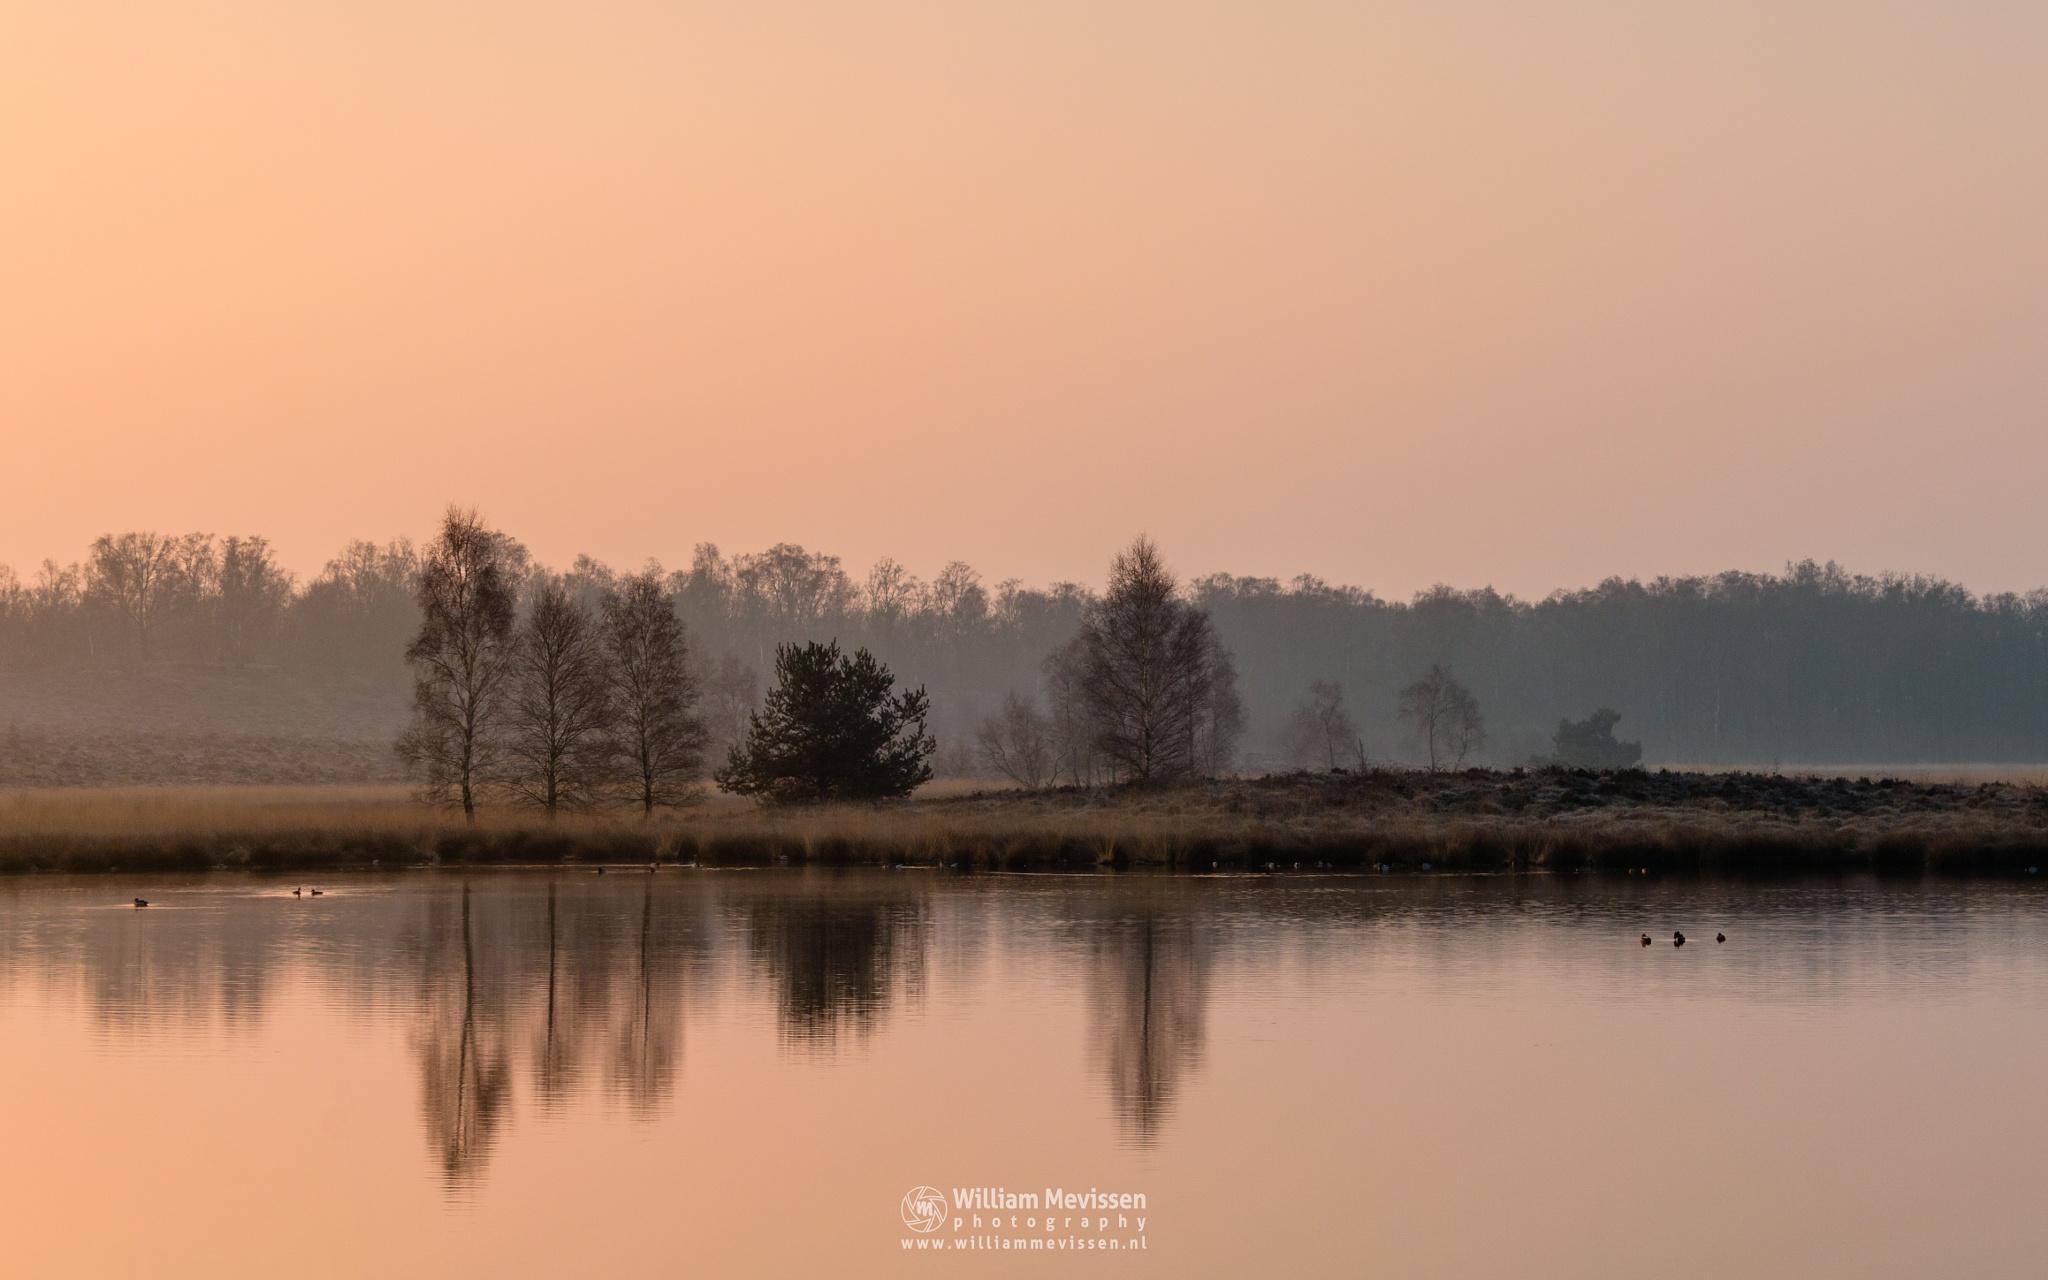 Morning Glow by William Mevissen